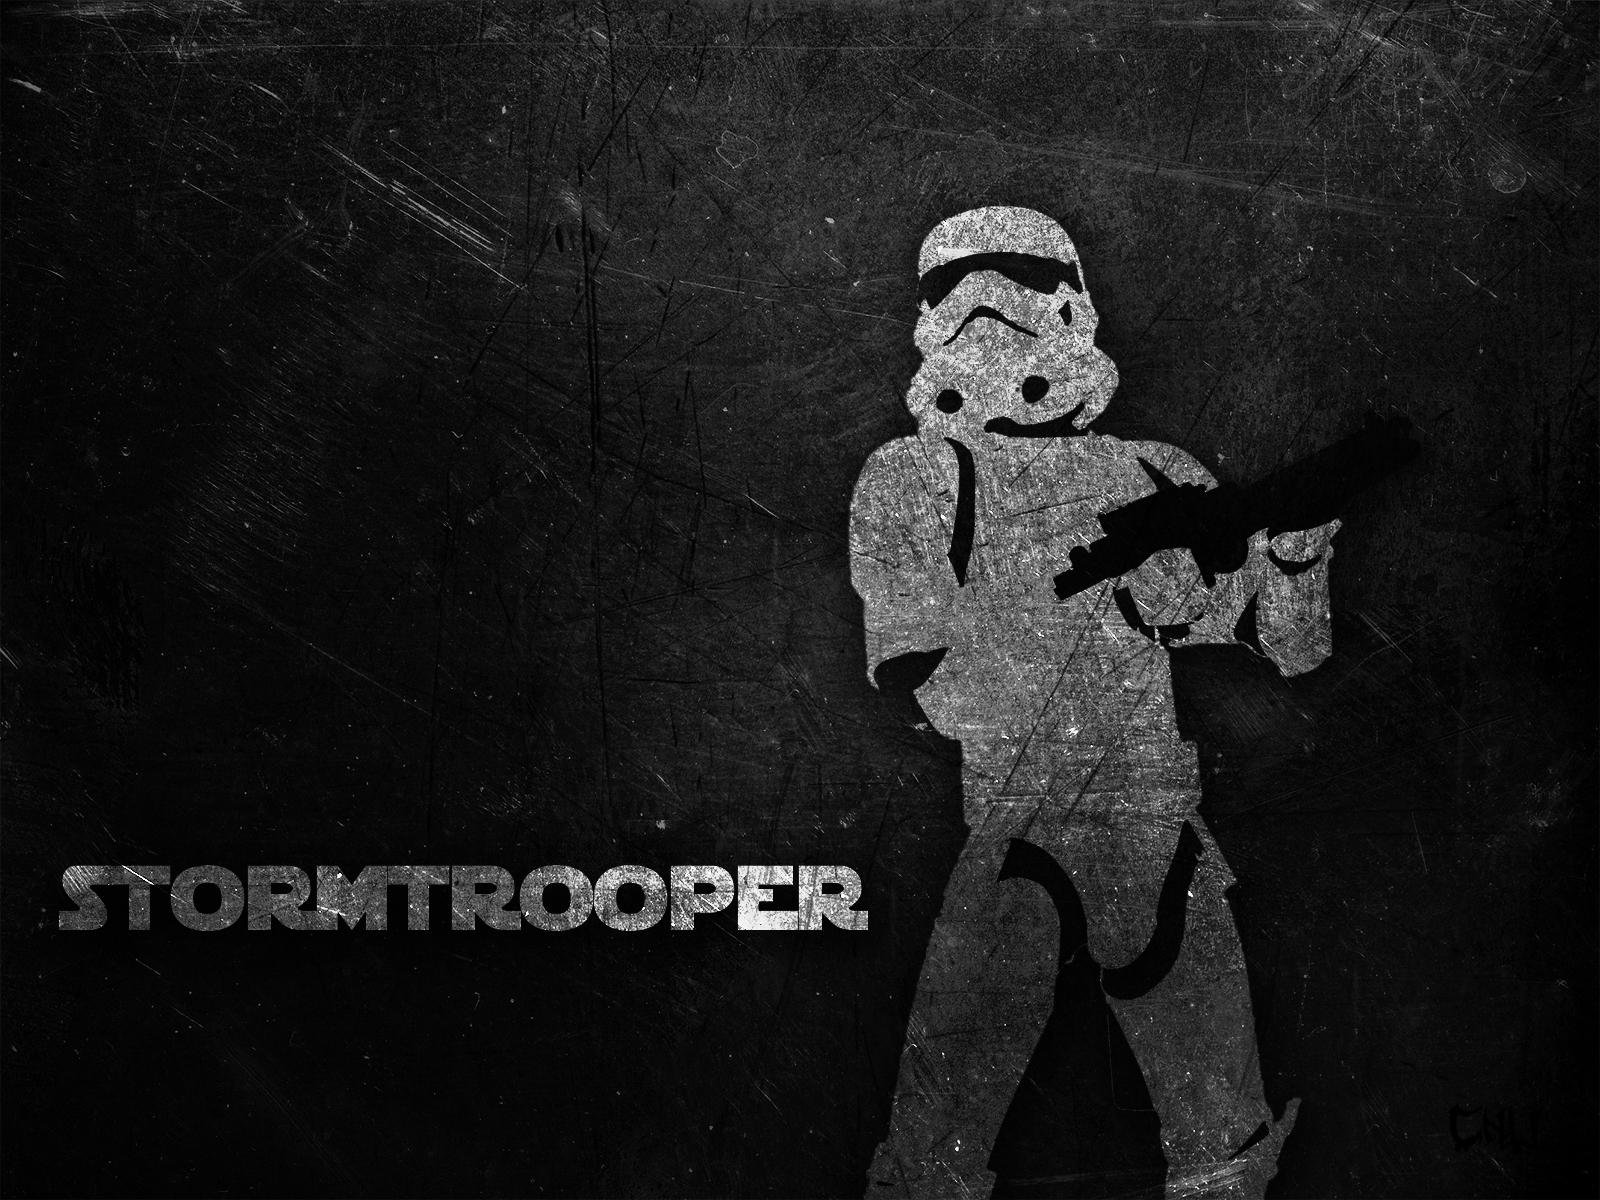 Stormtrooper desktop wallpaper wallpapersafari - Stormtrooper suit wallpaper ...